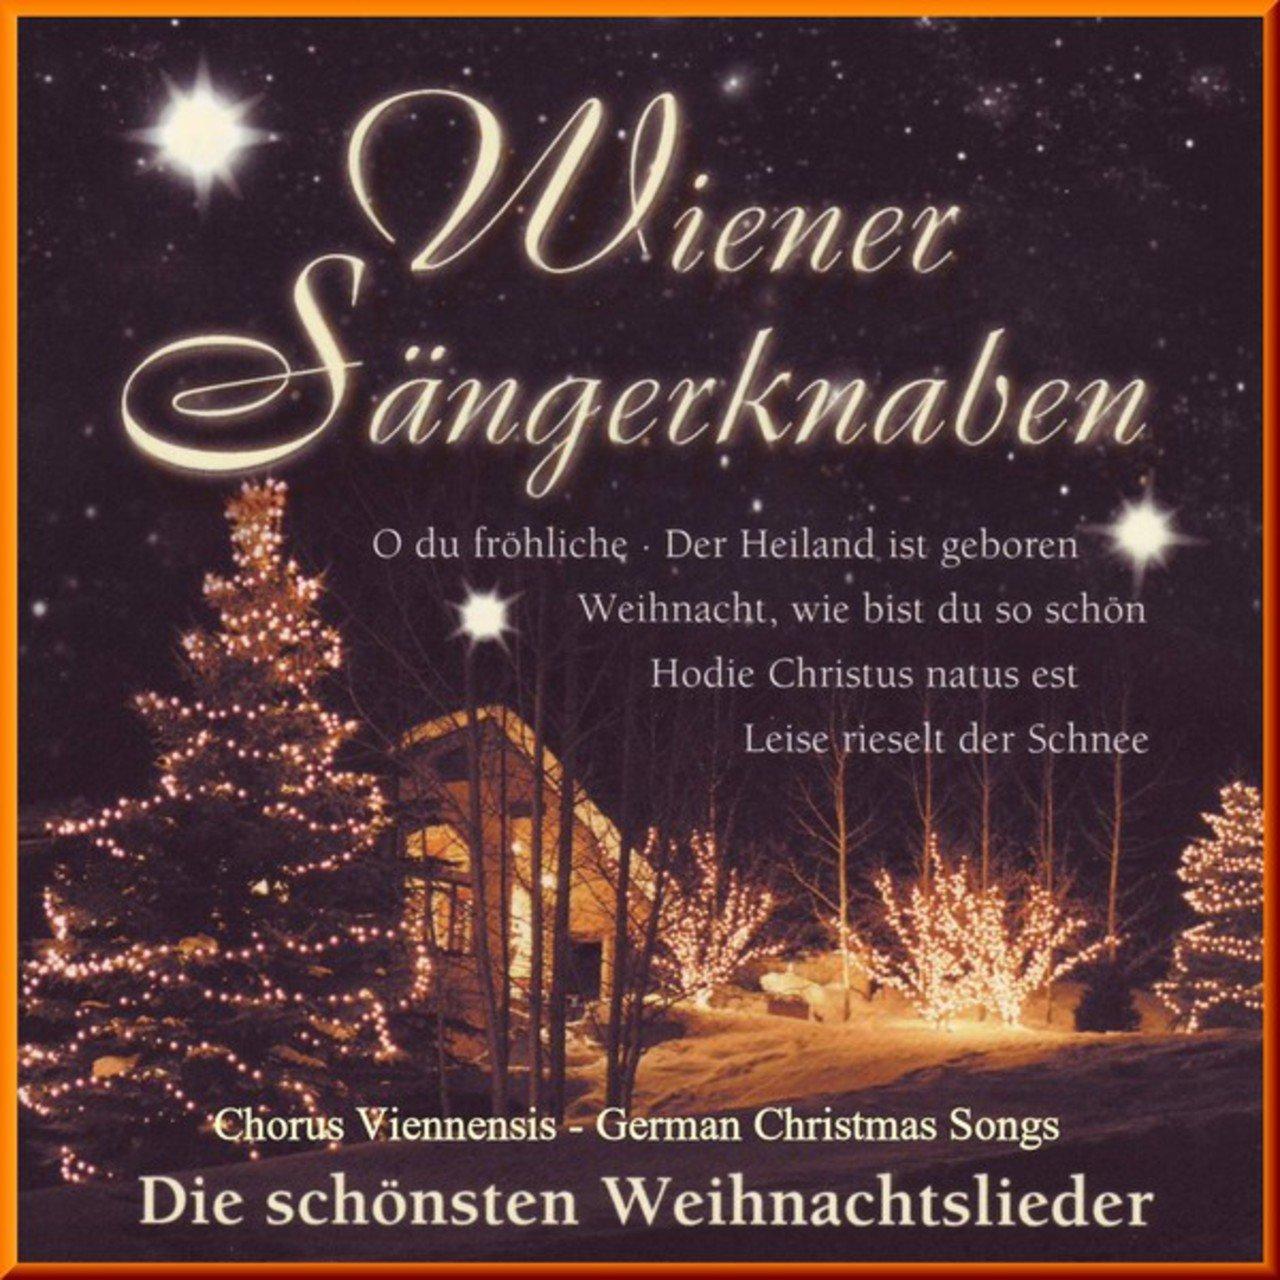 TIDAL: Listen to Süßer die Glocken nie klingen (Eloquence) on TIDAL